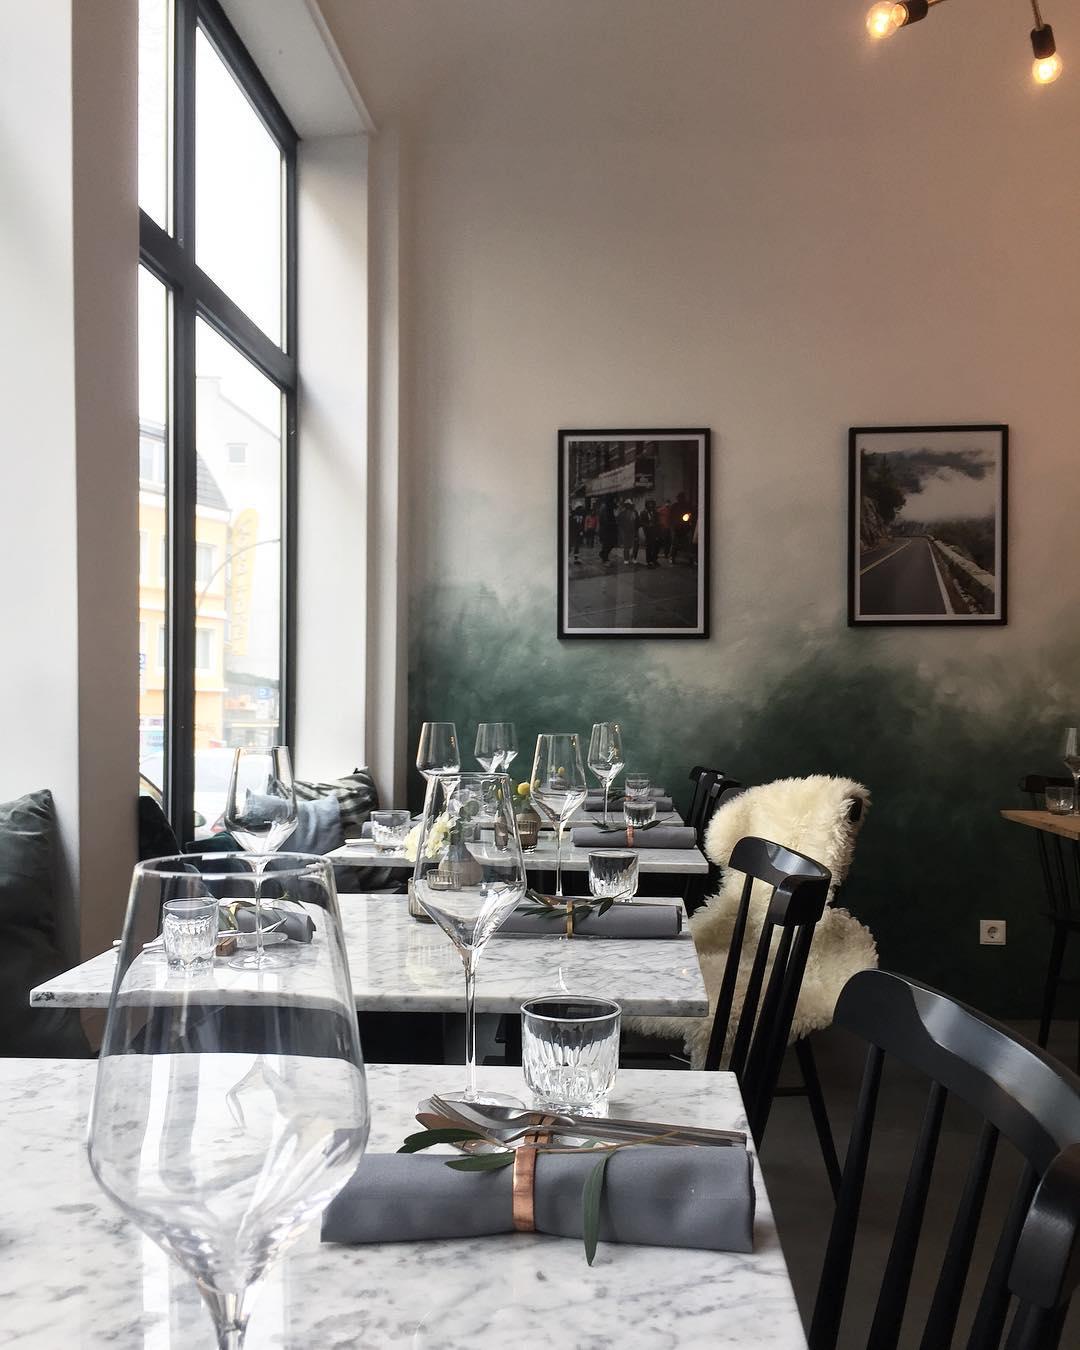 Foodwise Hamburg is so exciting! I interviewed Fabio Haebel chefhellip